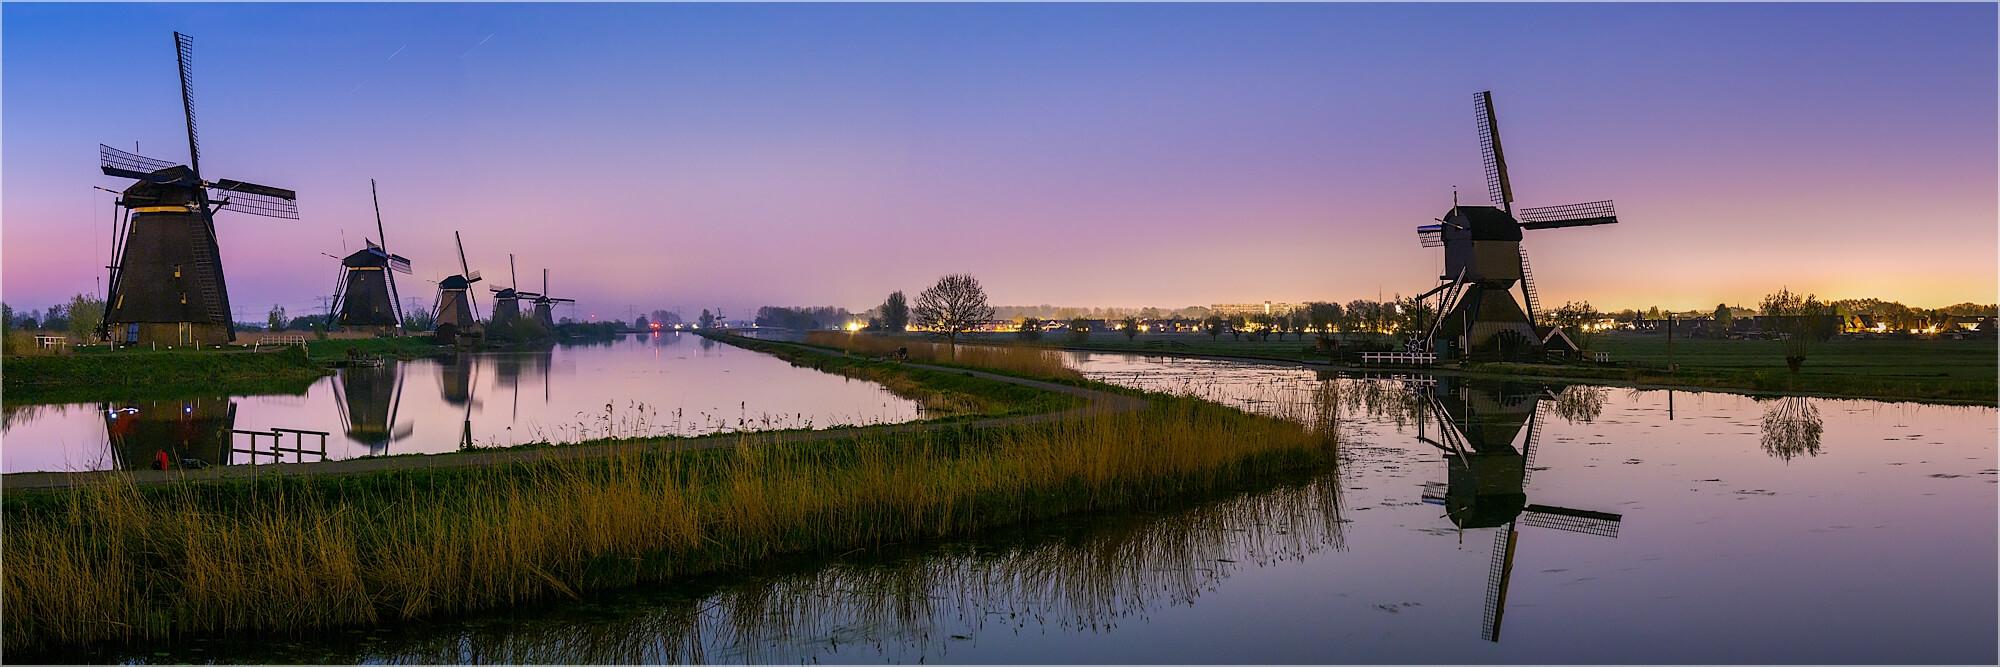 Panoramabild Sonnenaufgang Windmühlen in Kinderdijk Holland